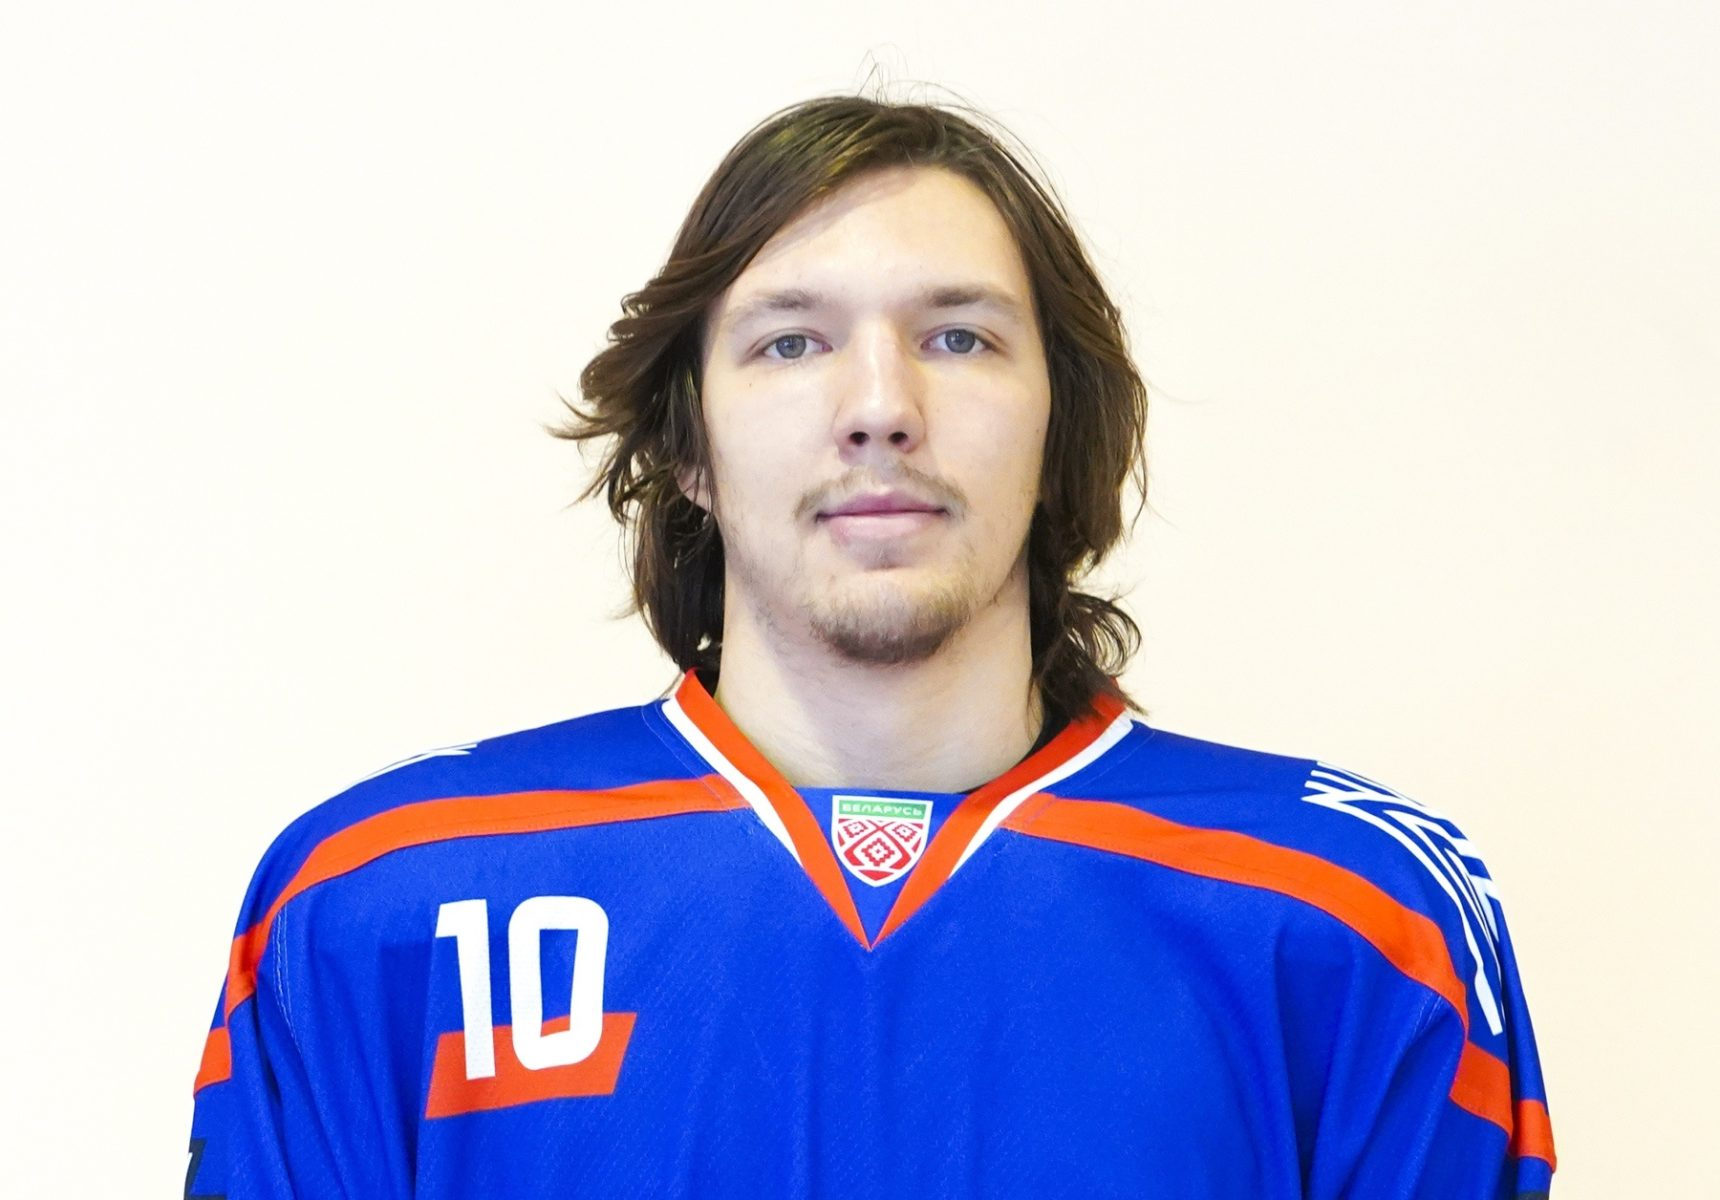 Максим Налётов. Фото: страница ХК «Локомотив» (Орша) во «ВКонтакте»